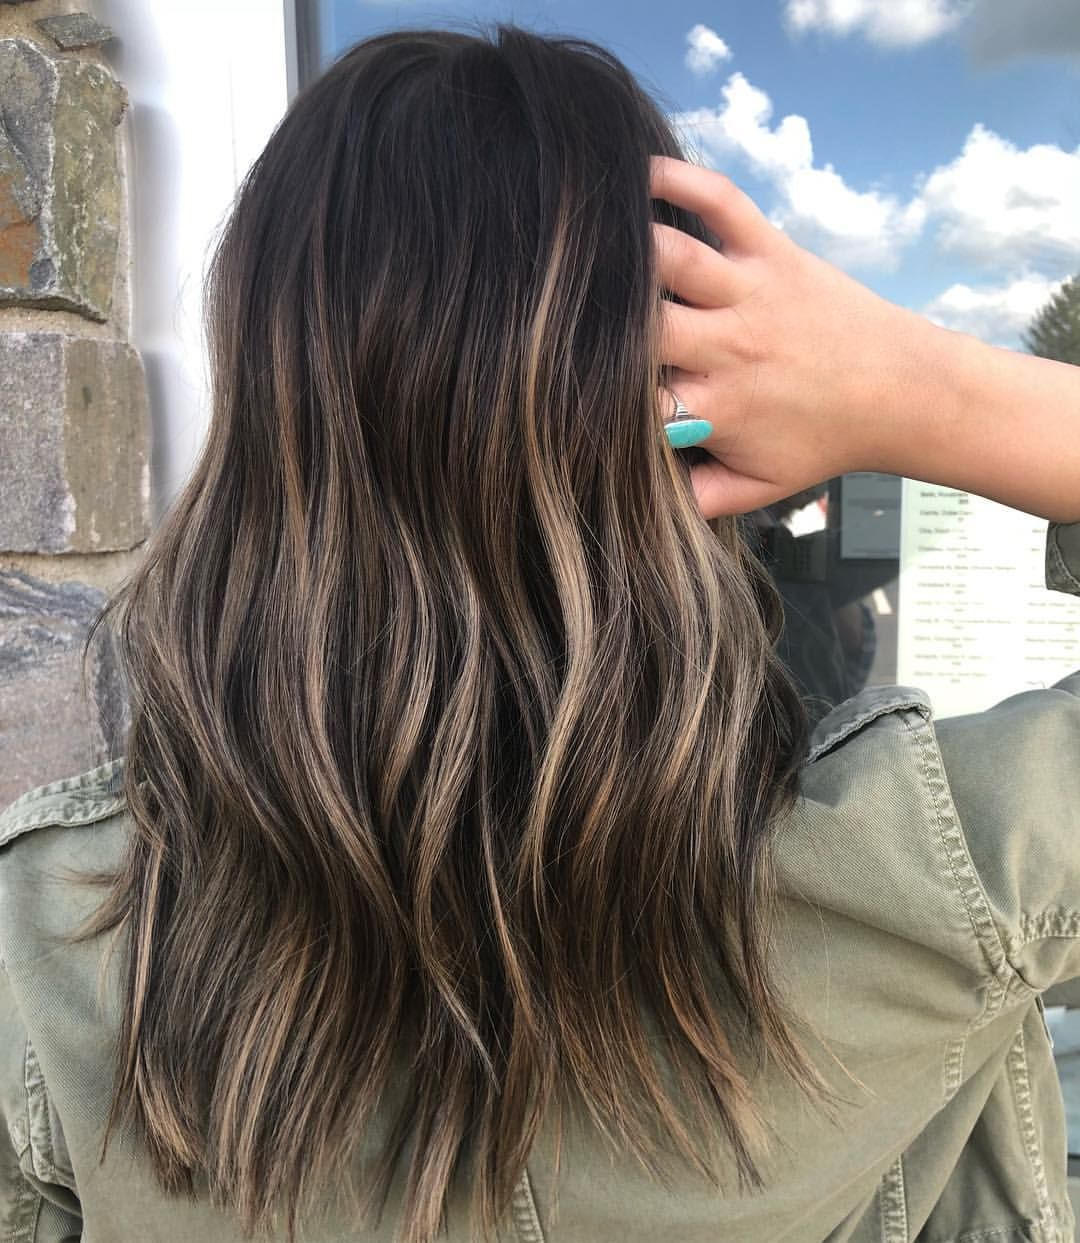 Brunette Hair Color Ideas Blonde Highlights On Brown Hair Fall Hair Ideas Bal Brunette Hair Color Medium Length Brown Hair Brown Hair With Blonde Highlights